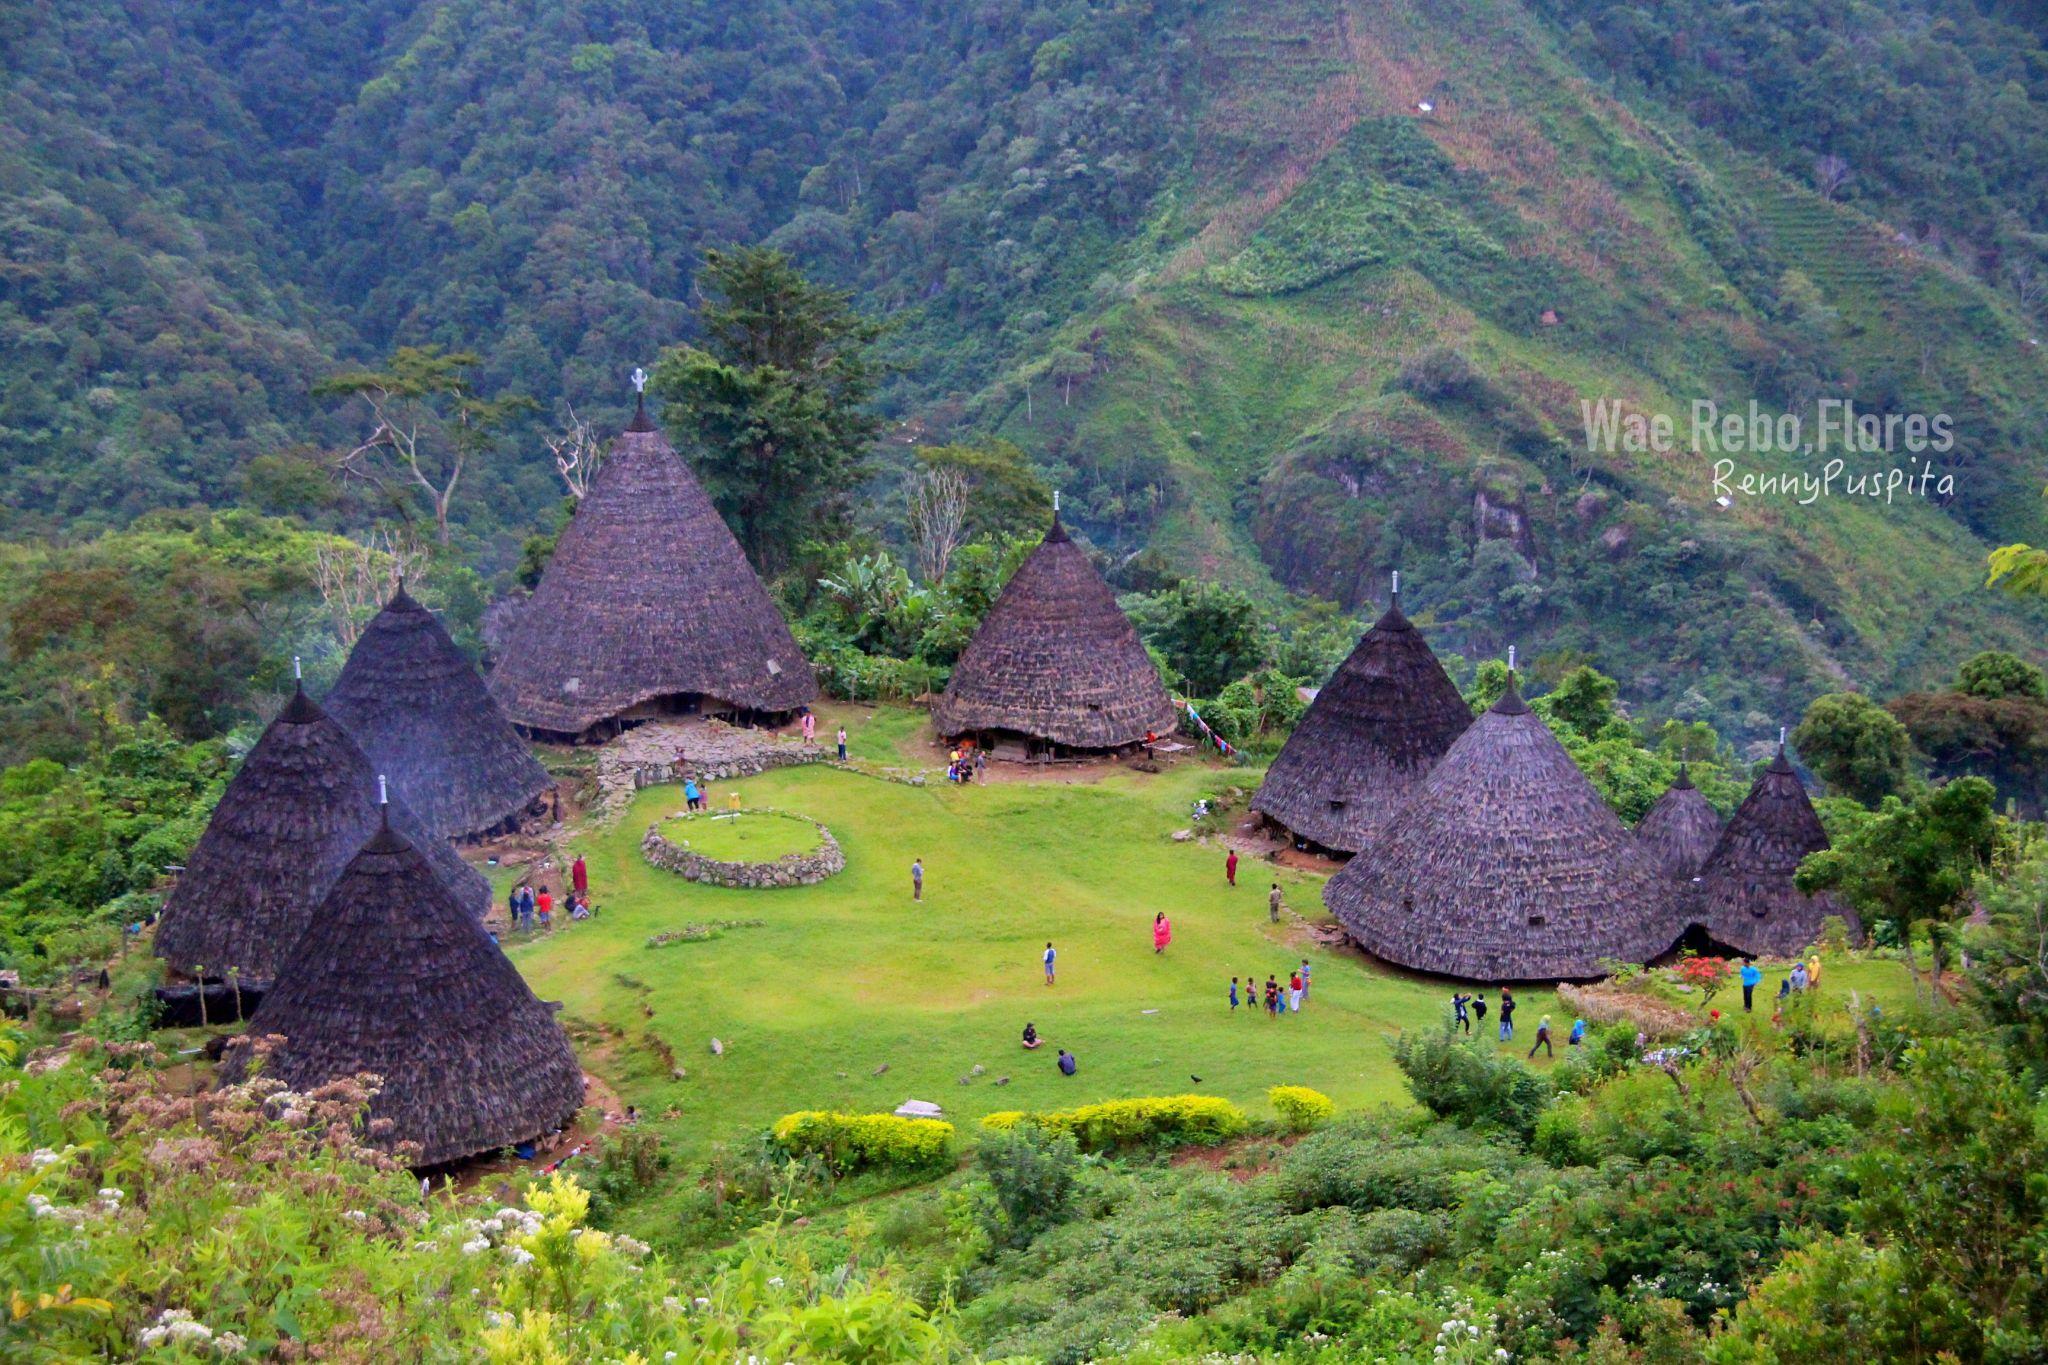 Wae Rebo Village, Flores - Indonesia, Indonesia